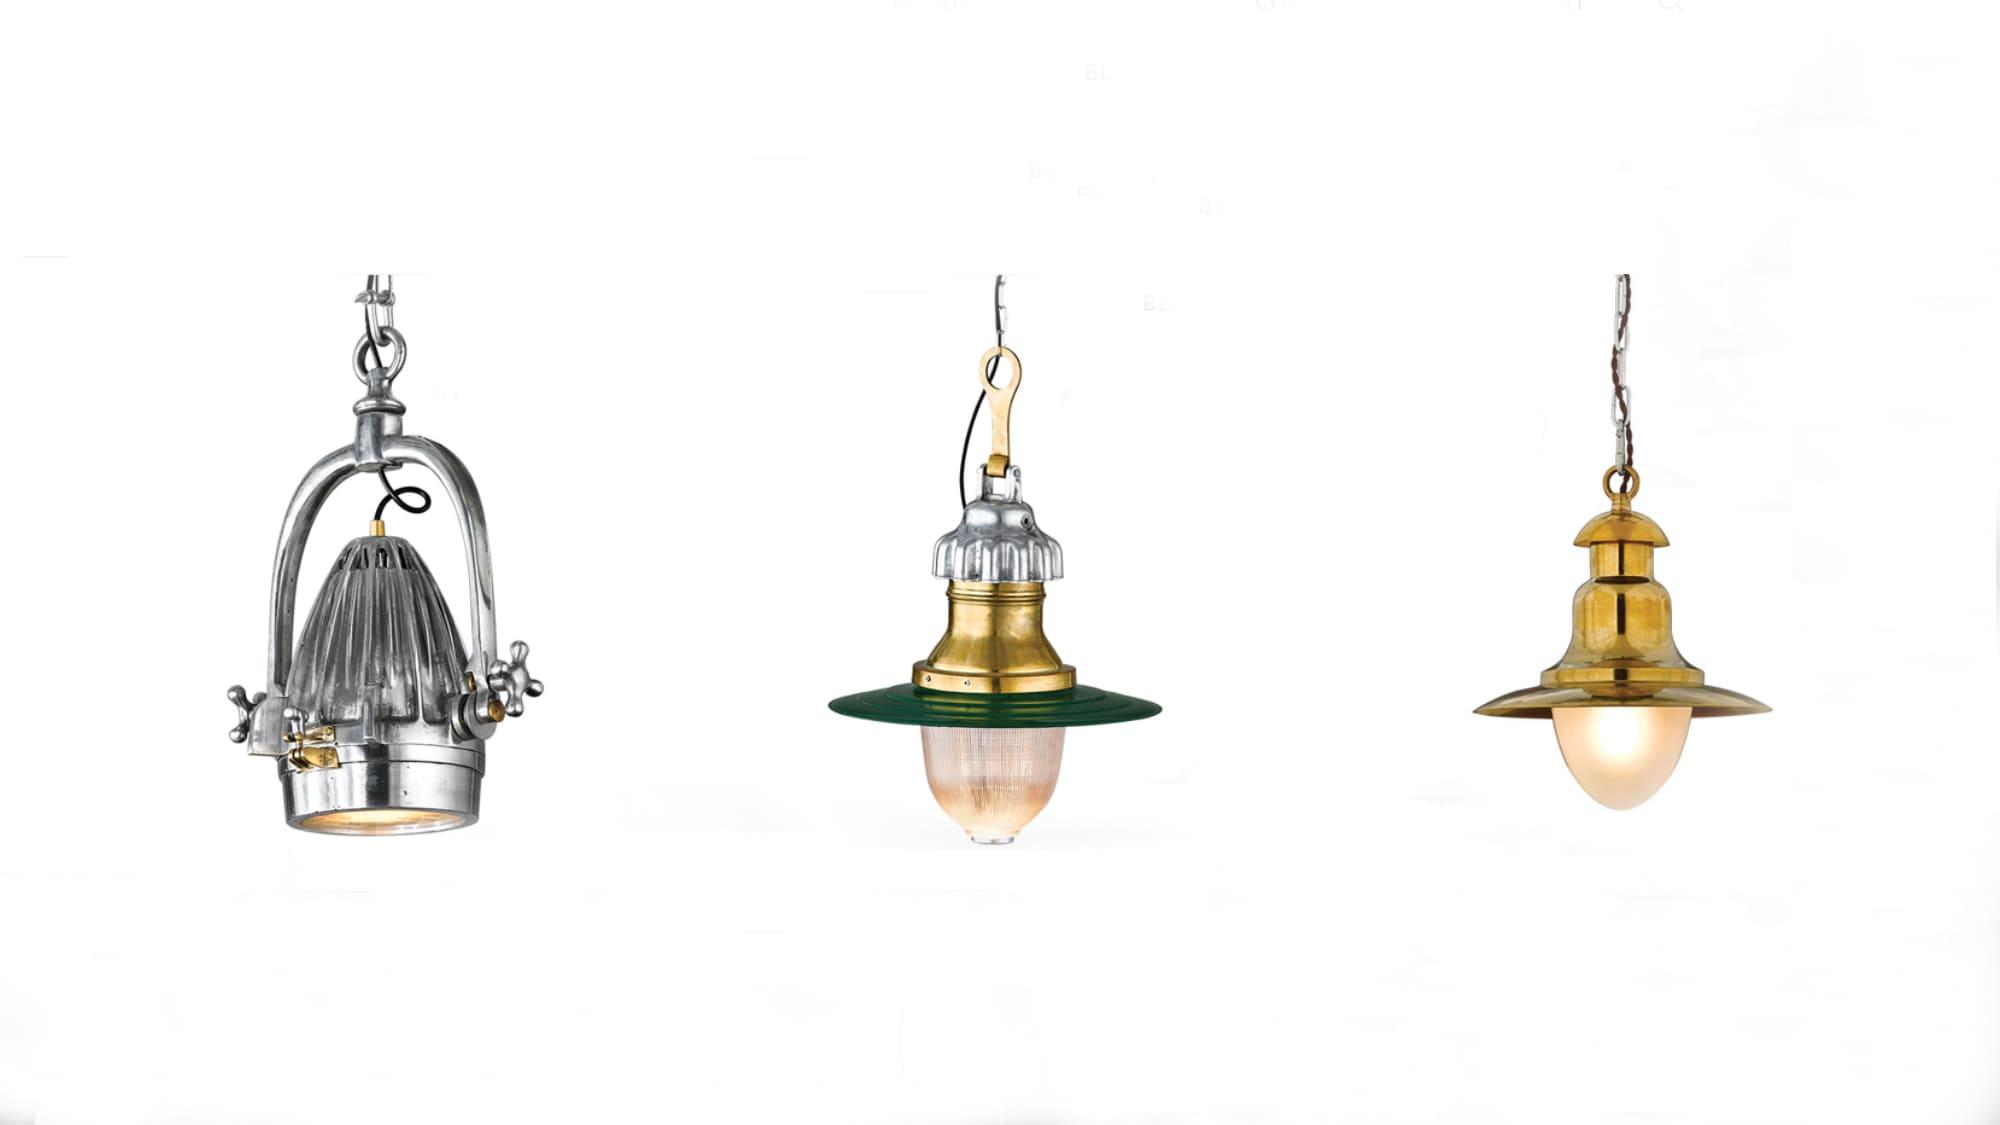 vintage industrial style pendant lights